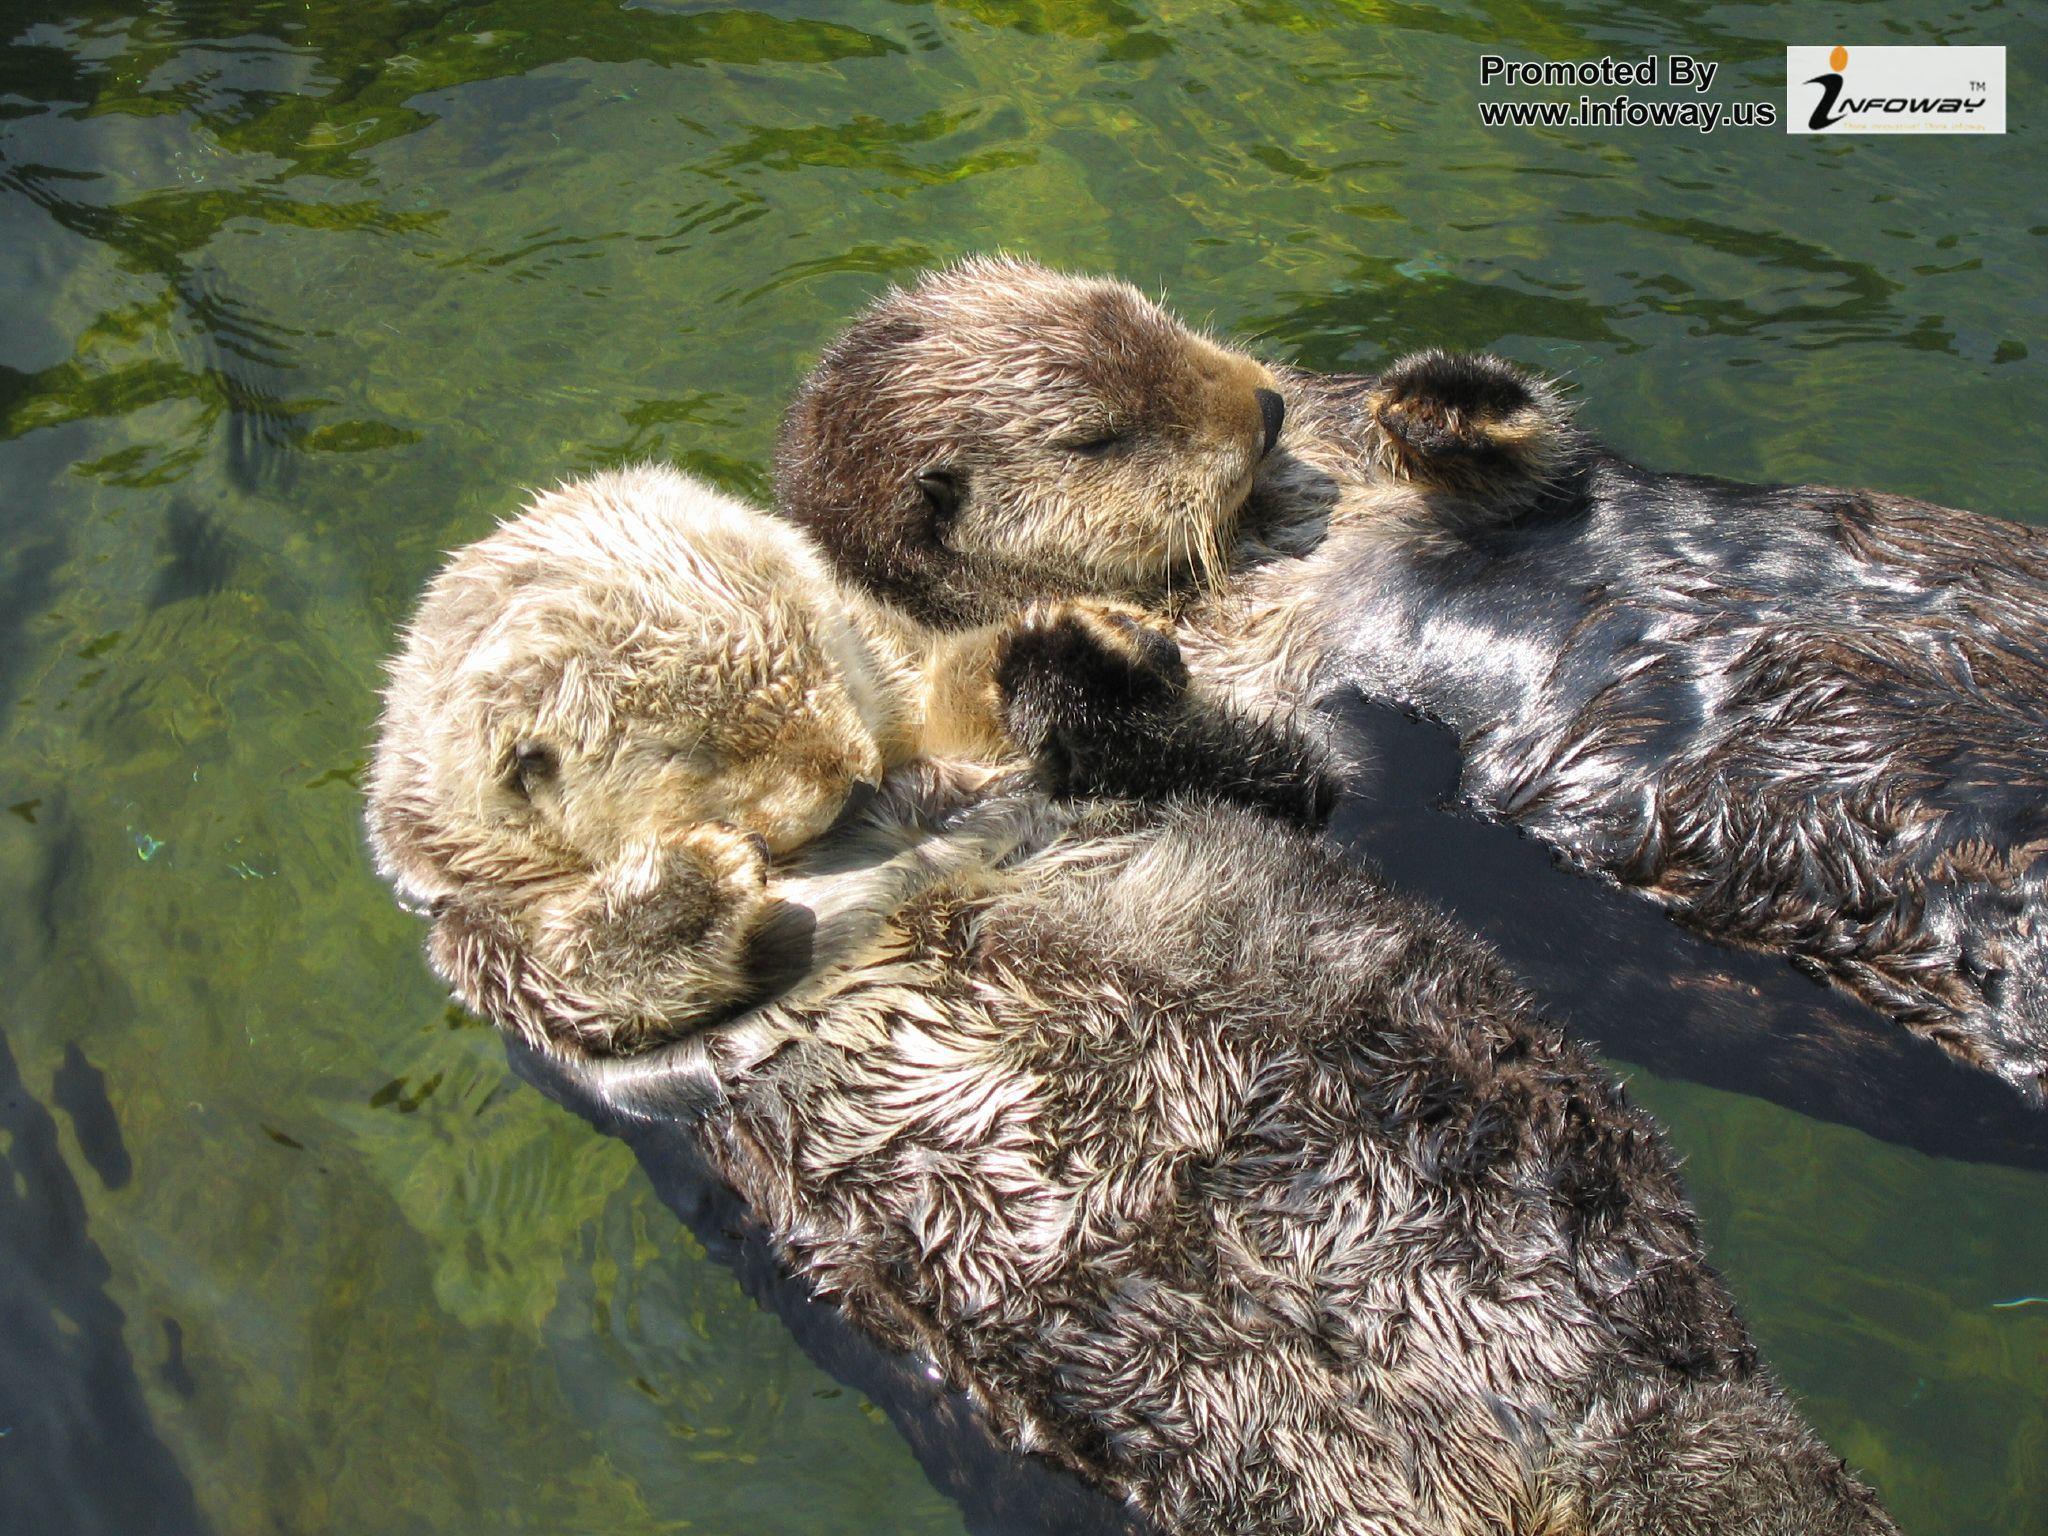 Cute river otters wallpaper   Photo 58 of 98 phombocom 2048x1536